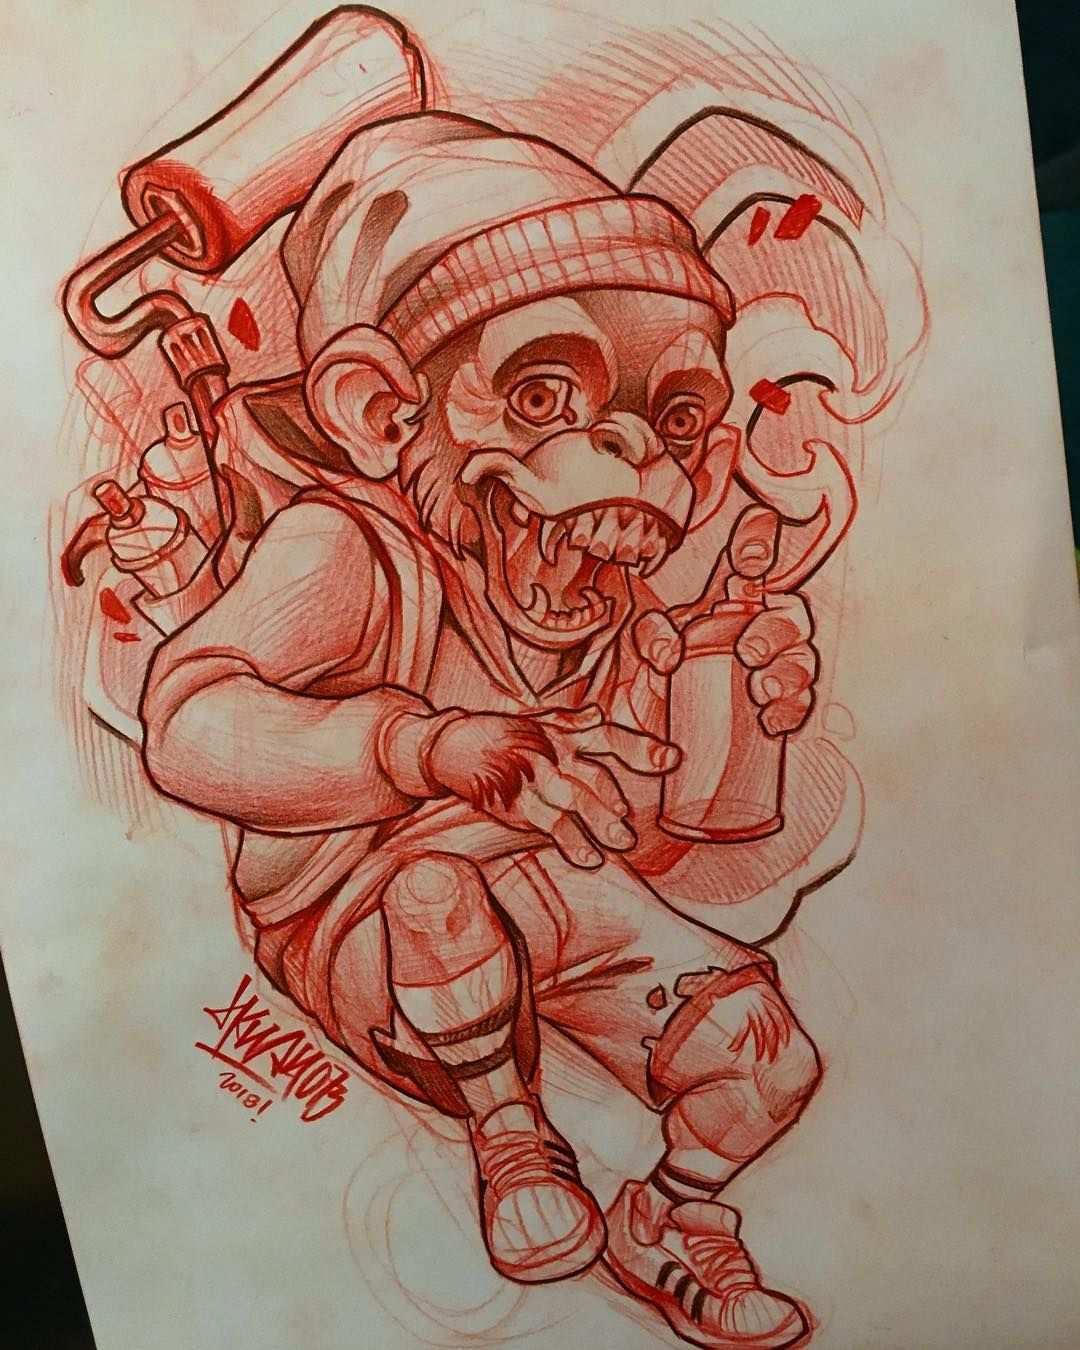 Novosti Arte De Rua Graffiti Tattoo Desenho Tattoo